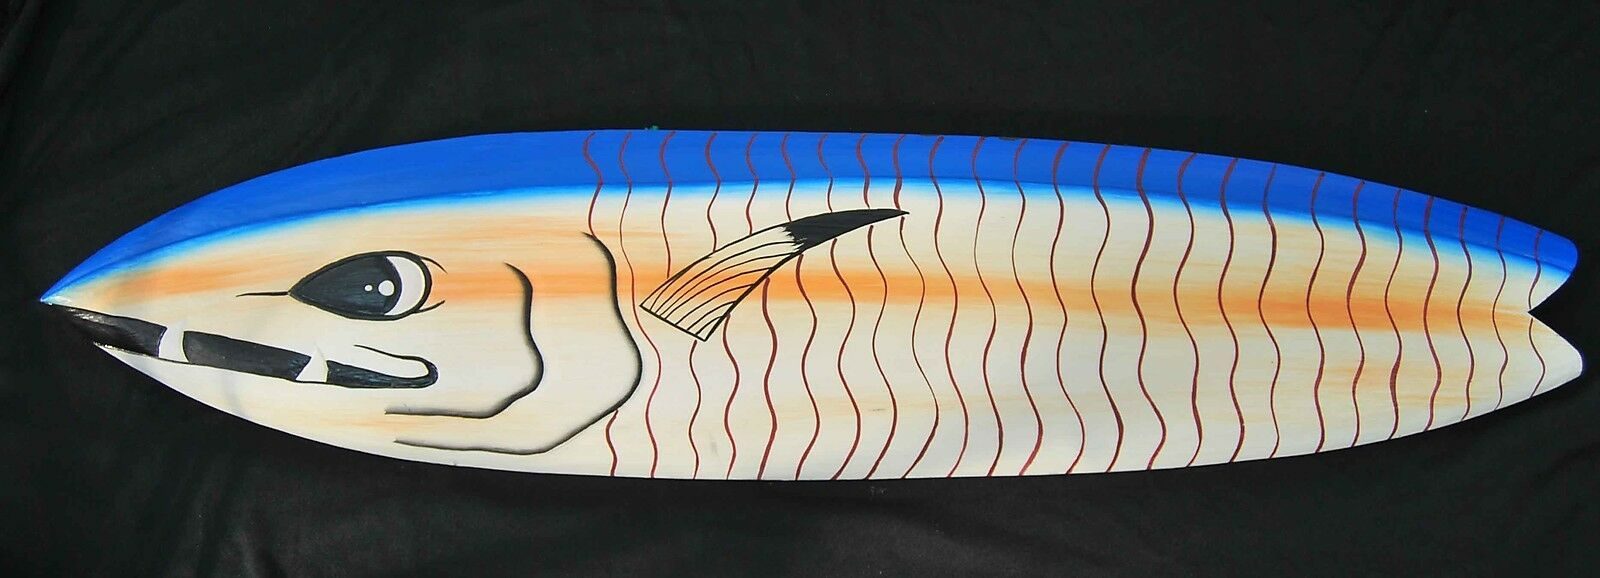 Decor Surfboard with Predator Fish Motif in 100cm Length Surf Board Fish